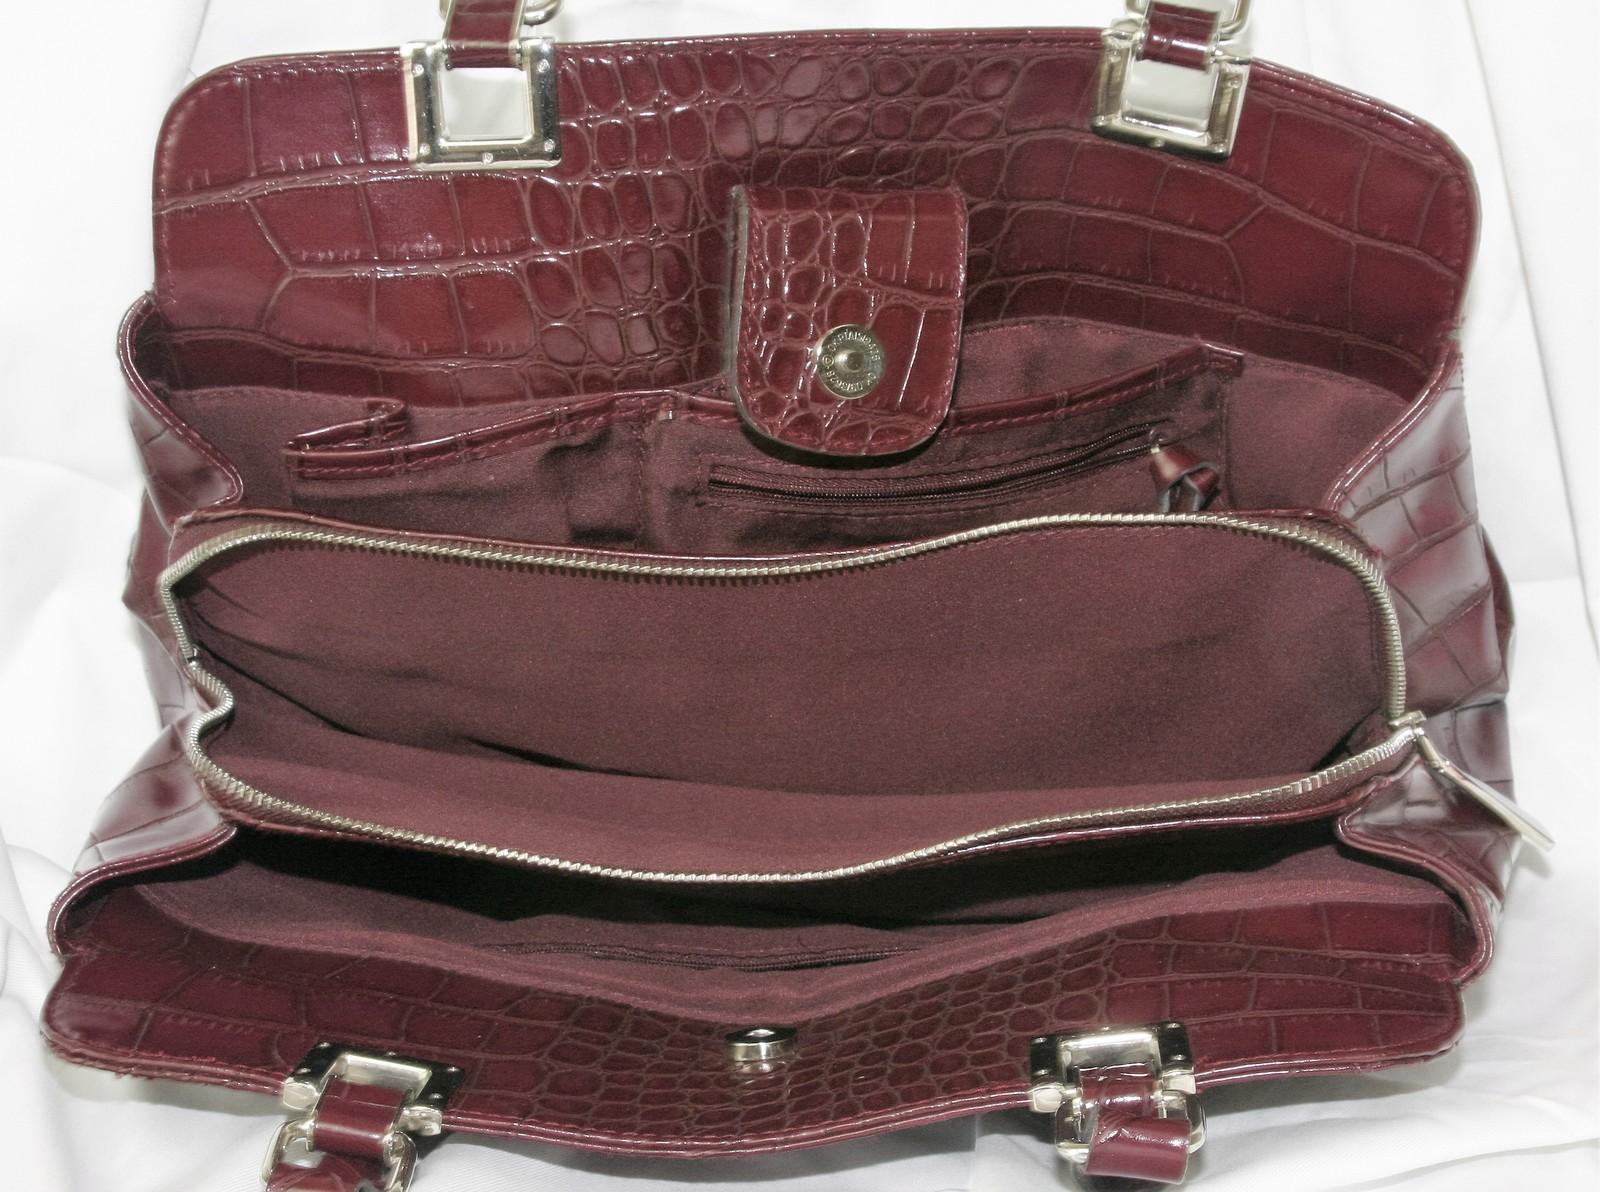 Liz Claiborne  Ladies Embossed Shoulder Bag Laptop Case Purse Handbag